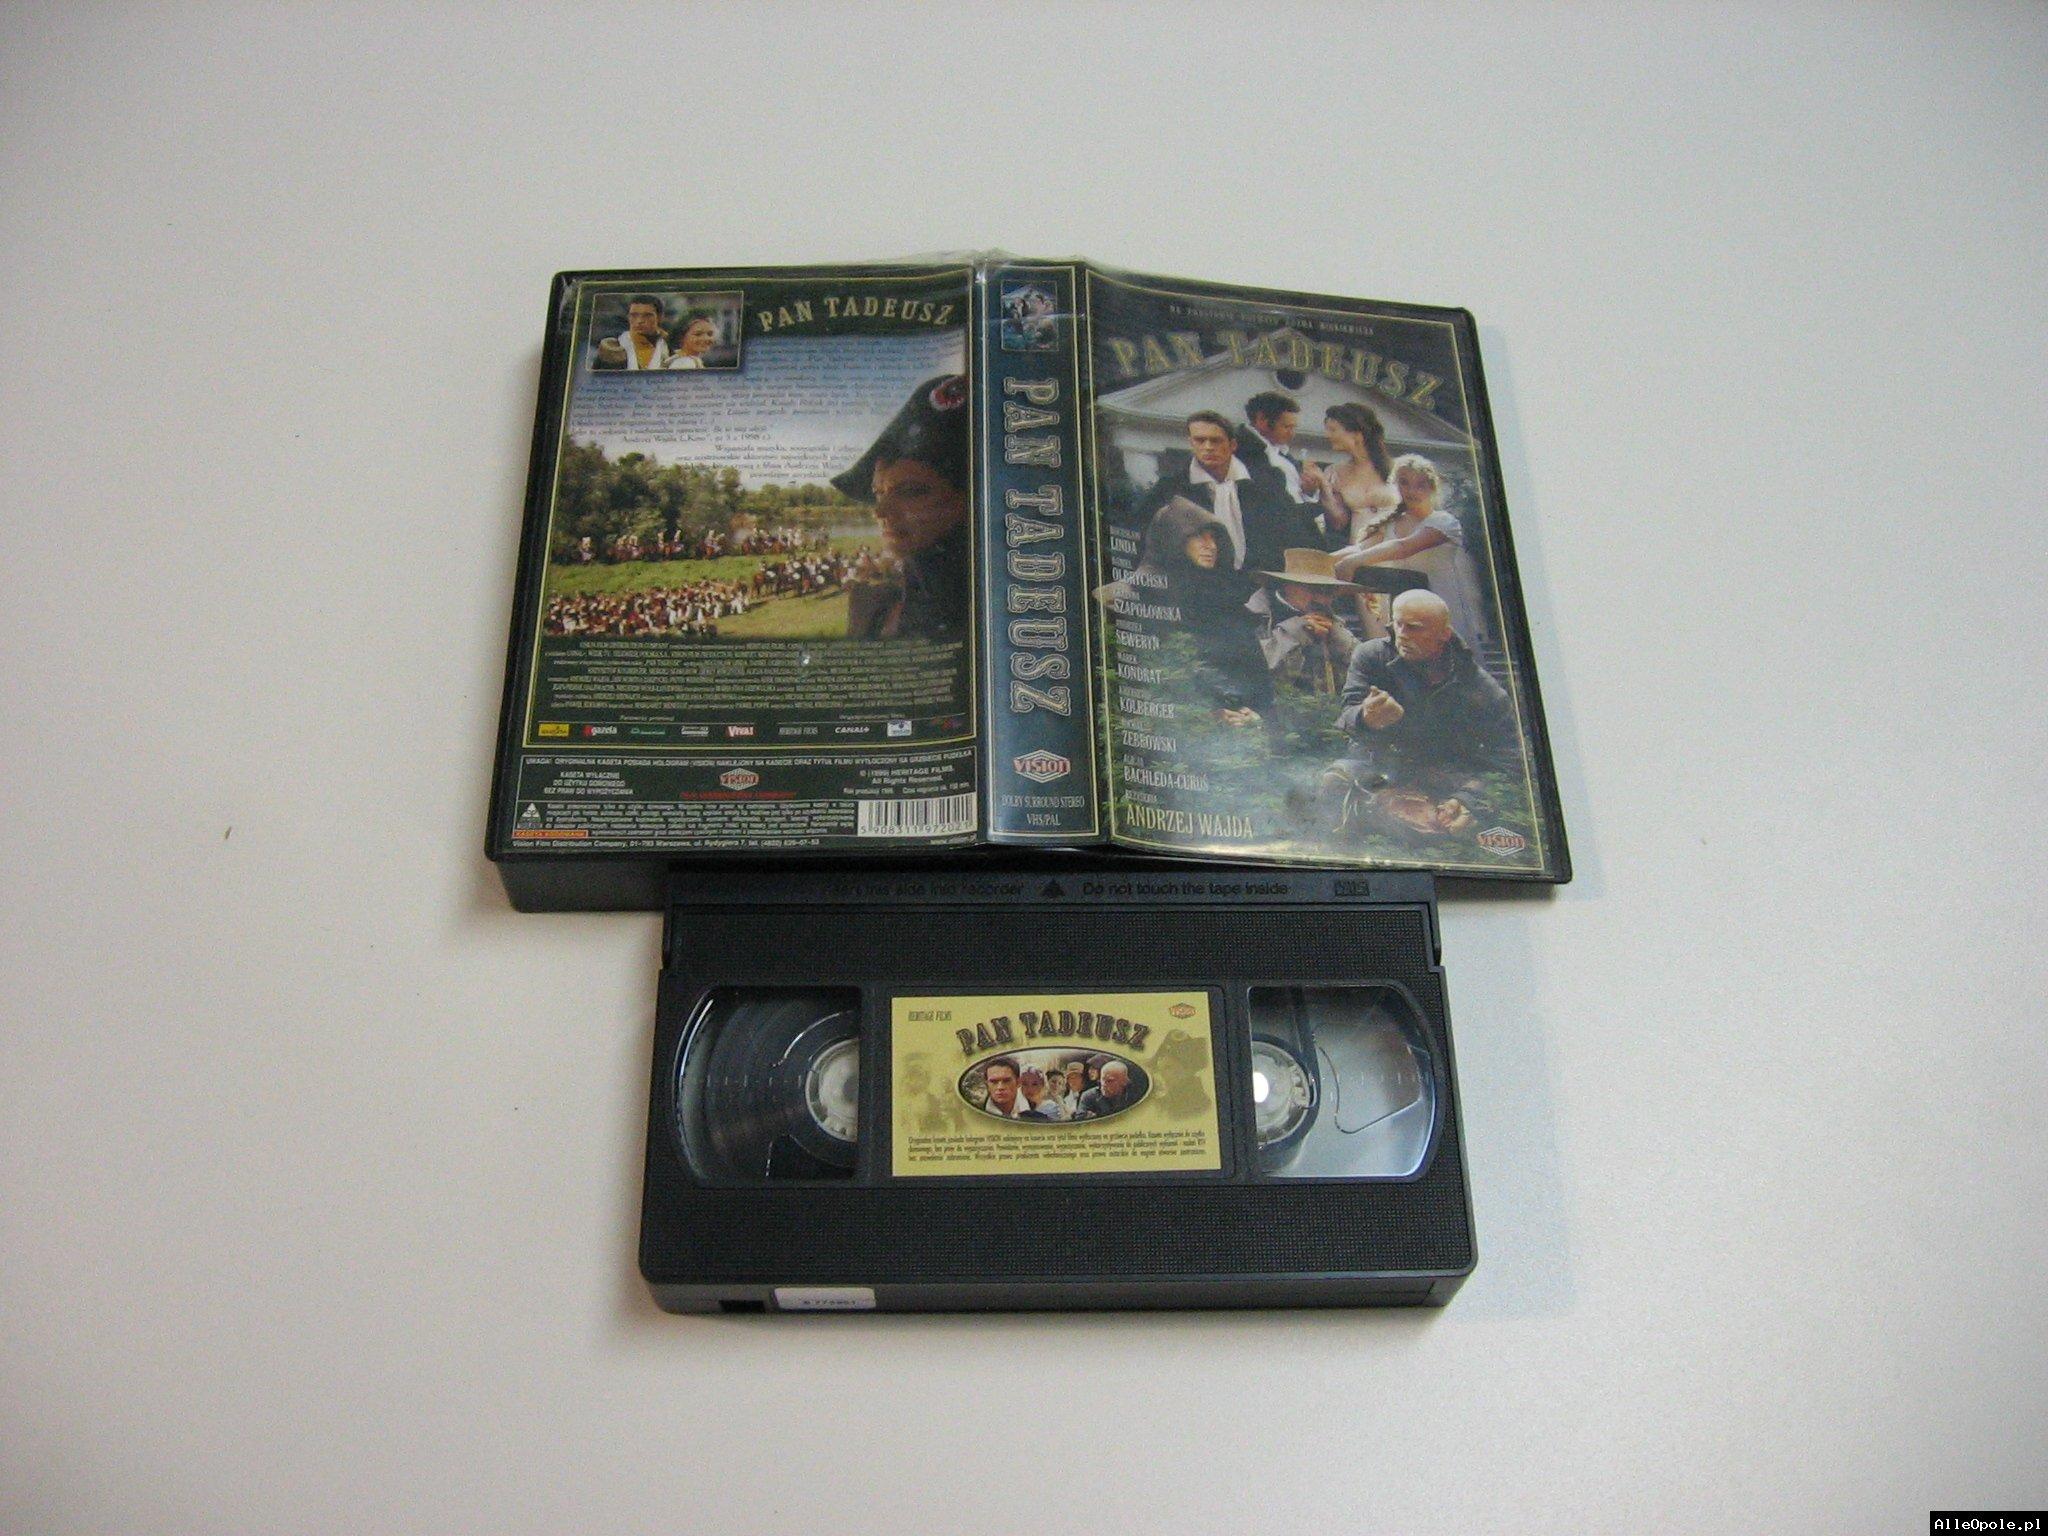 PAN TADEUSZ - VHS Kaseta Video - Opole 1803